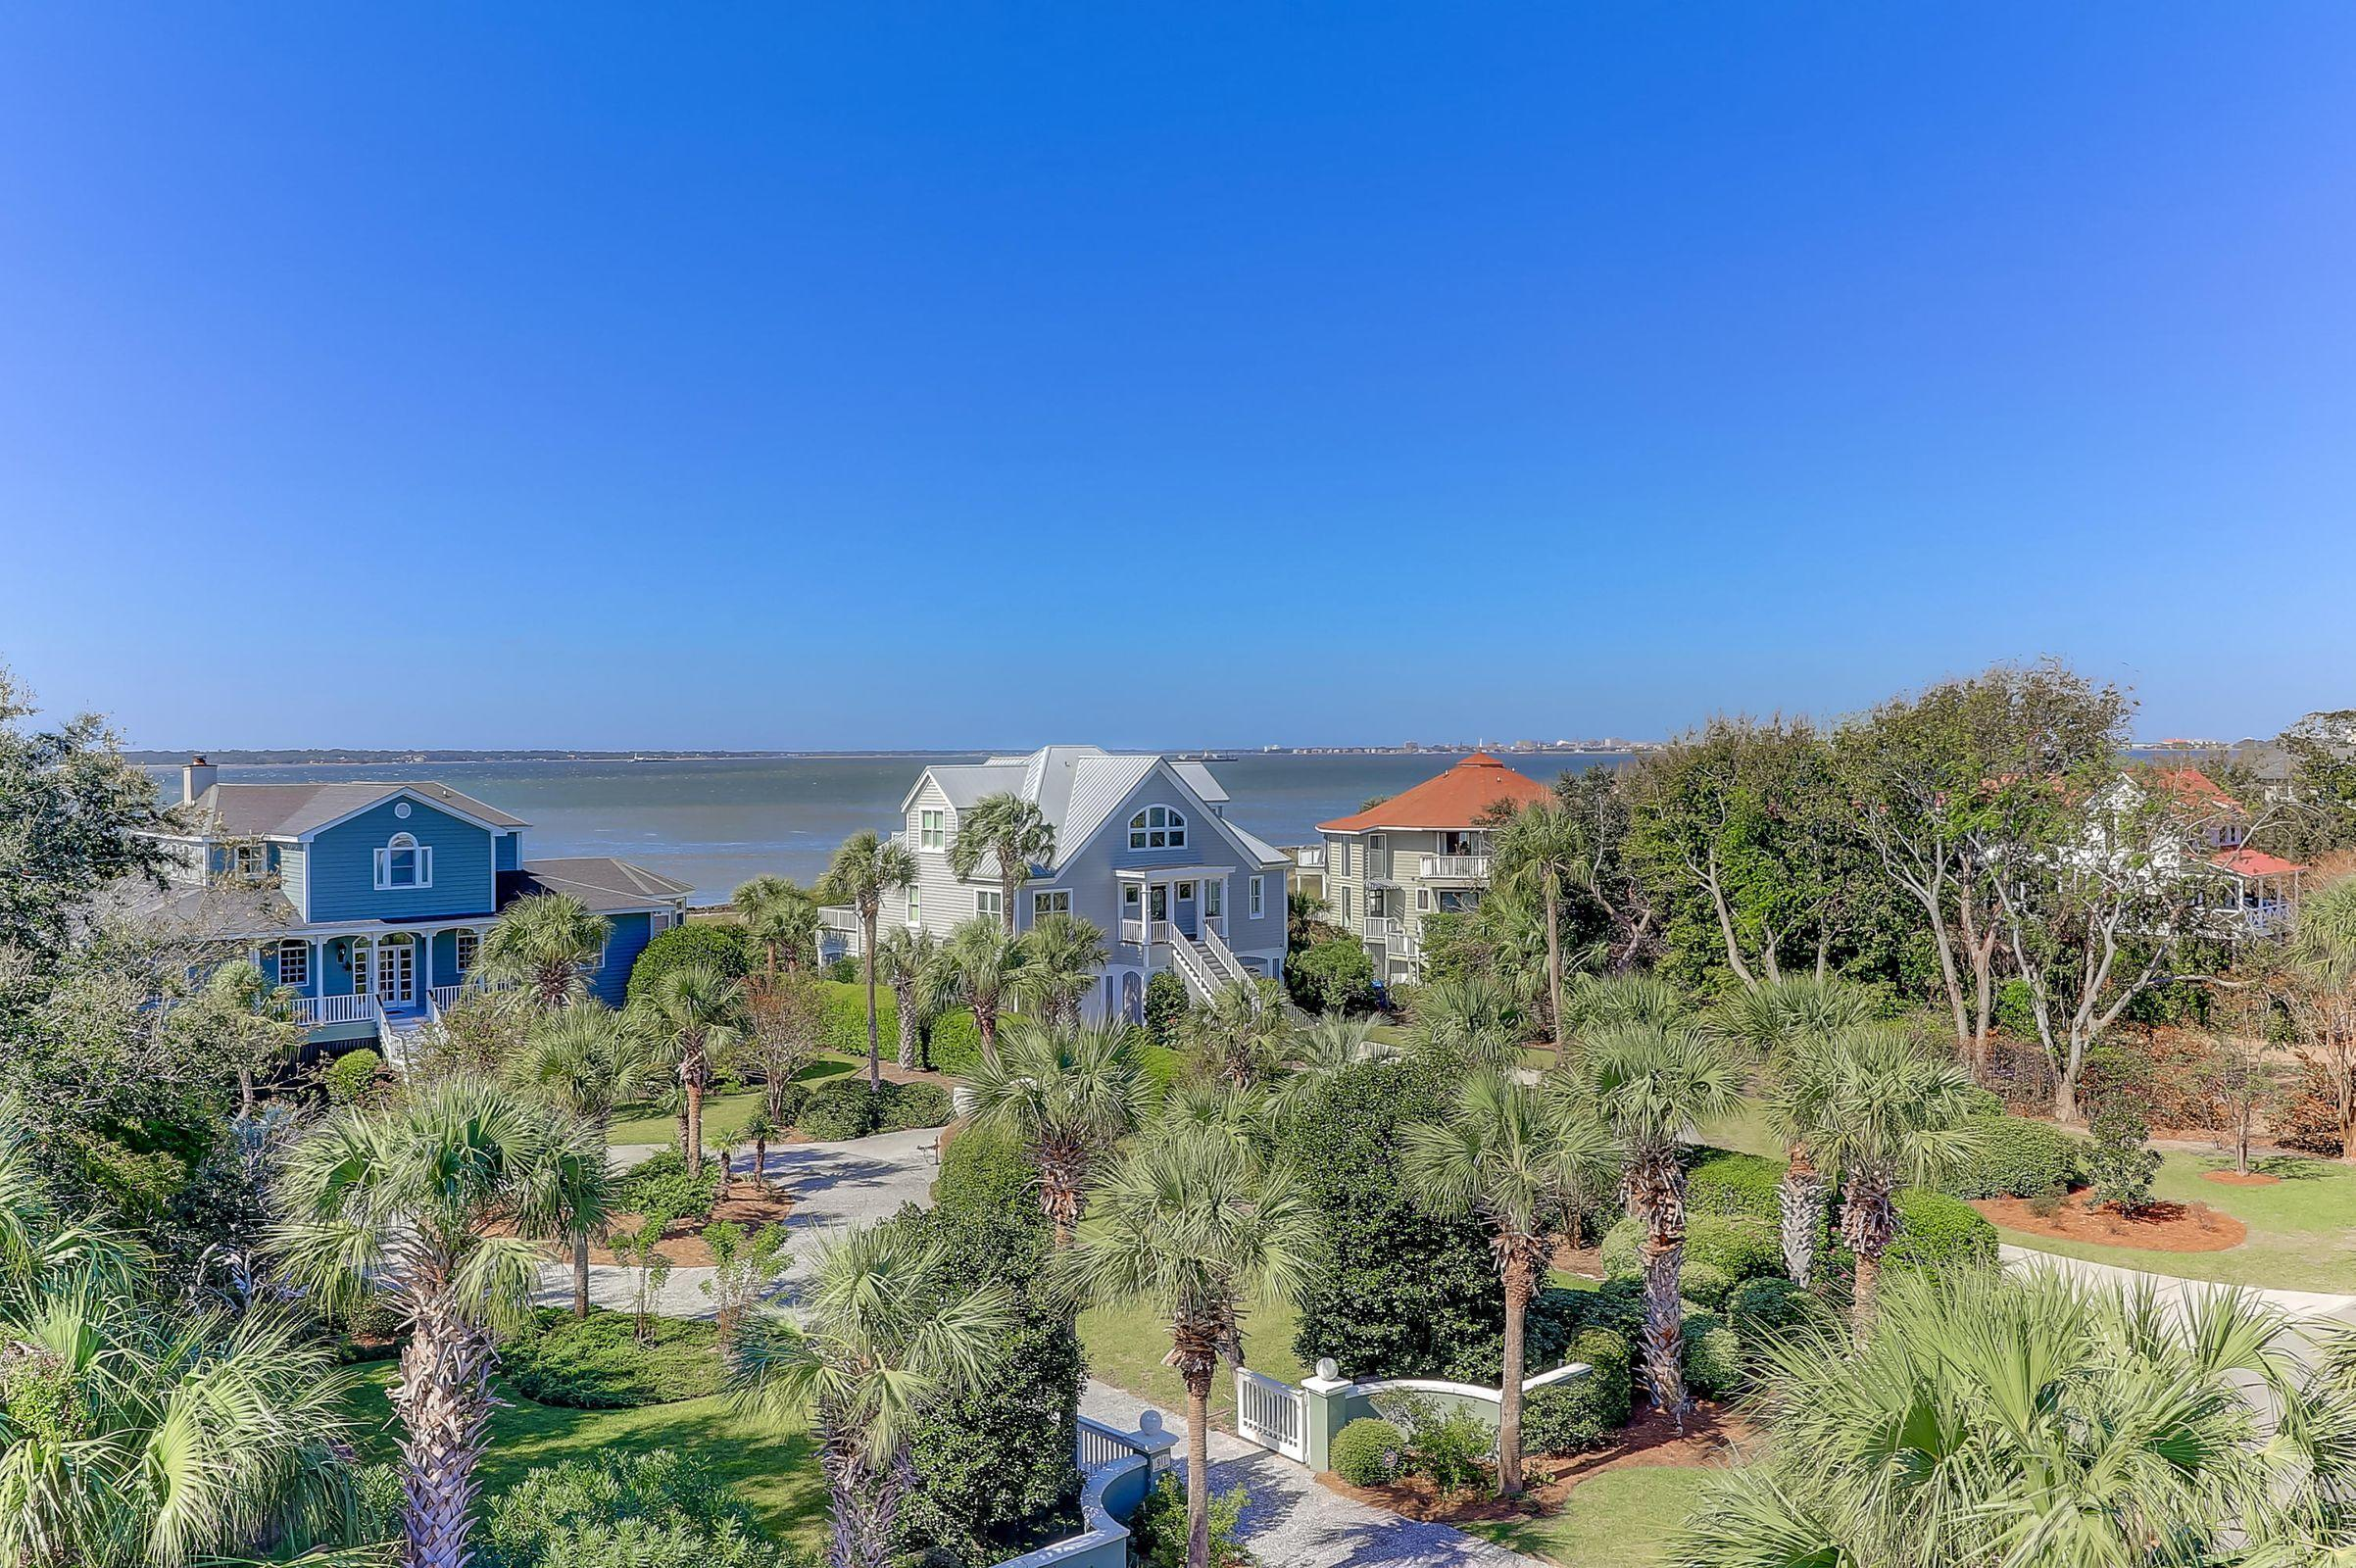 Sullivans Island Homes For Sale - 918 Middle, Sullivans Island, SC - 41